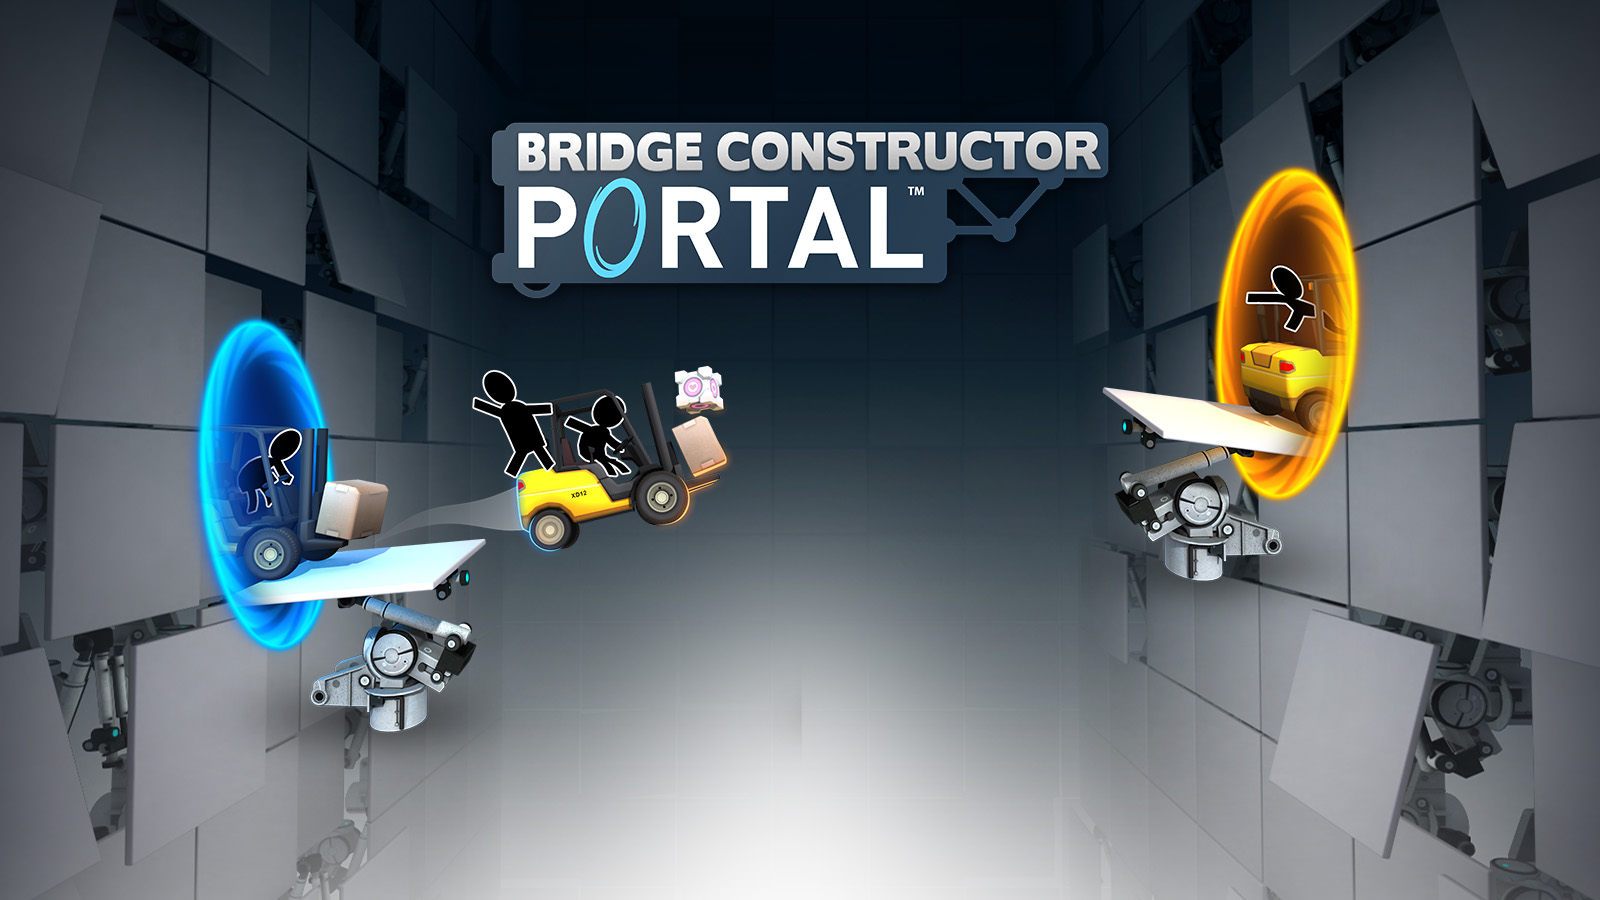 Bridge Constructor Portal Game Ps4 Playstation